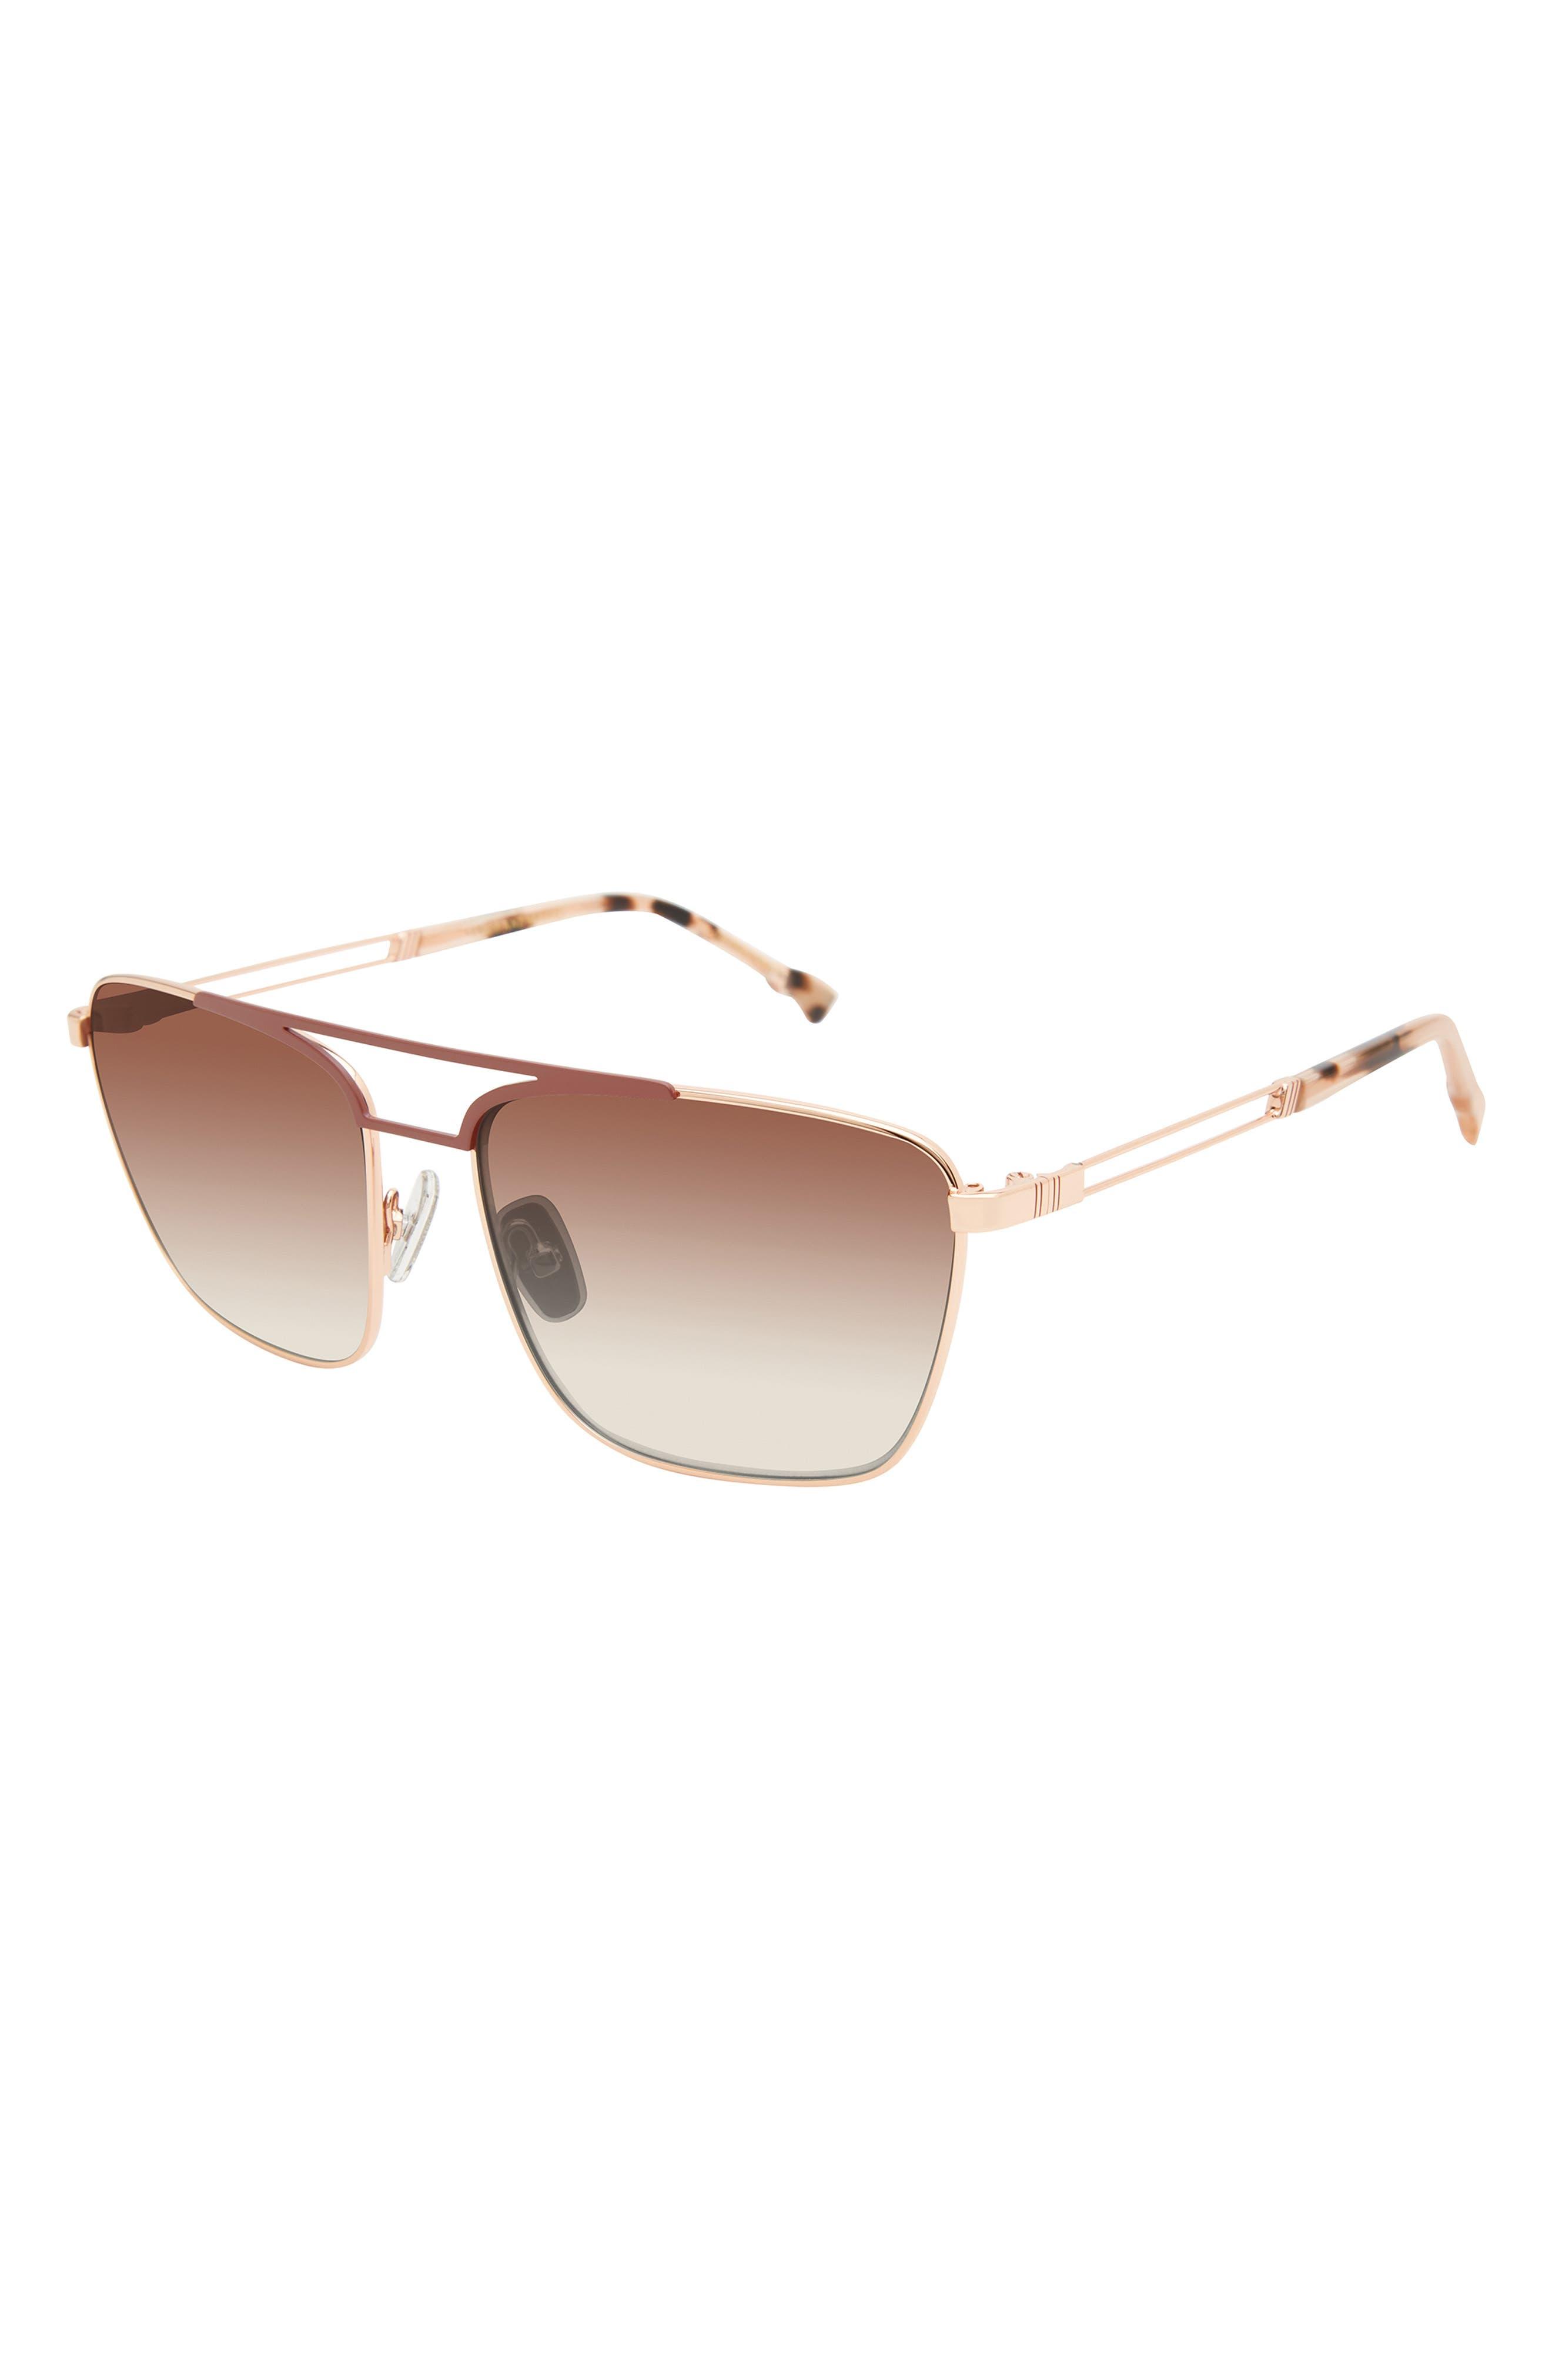 Manifest 57mm Navigator Sunglasses